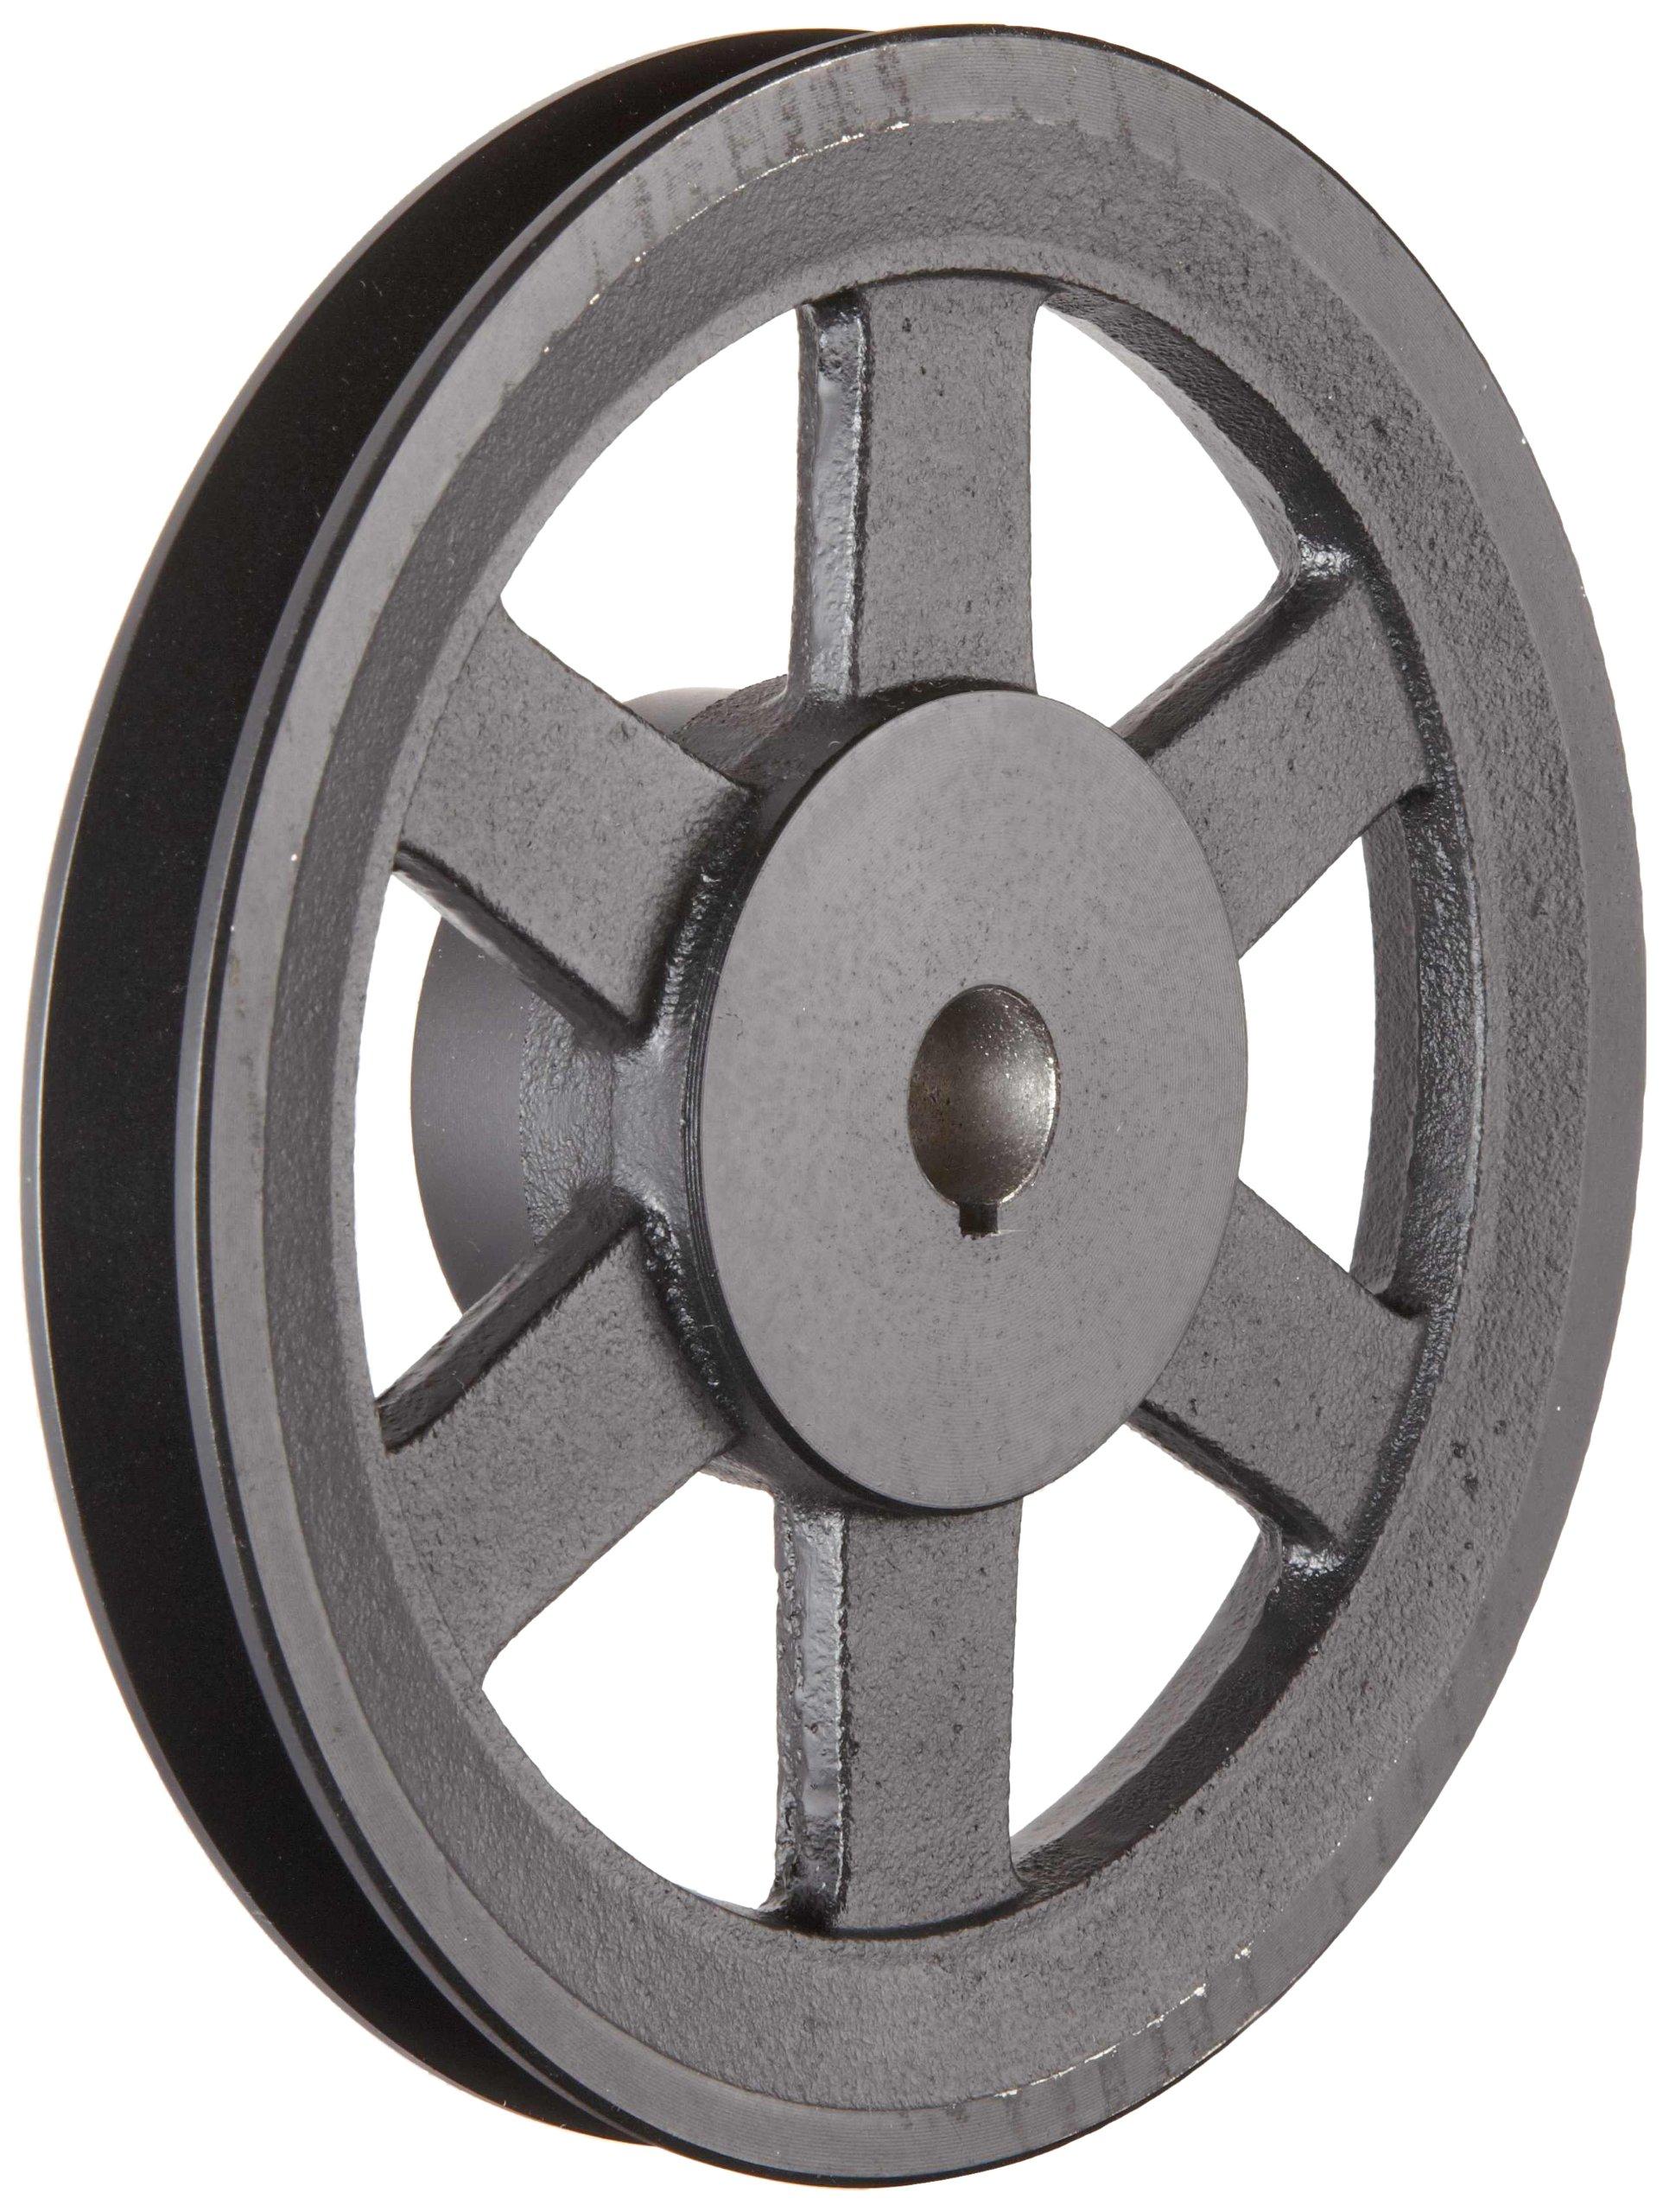 "Martin BK80 7/8 FHP Sheave BS, 4L/5L or B Belt Section, 1 Groove, 7/8"" Bore, Class 30 Gray Cast Iron, 7.75"" OD, 3201 max rpm, 7 Datum/7.4 Datum"